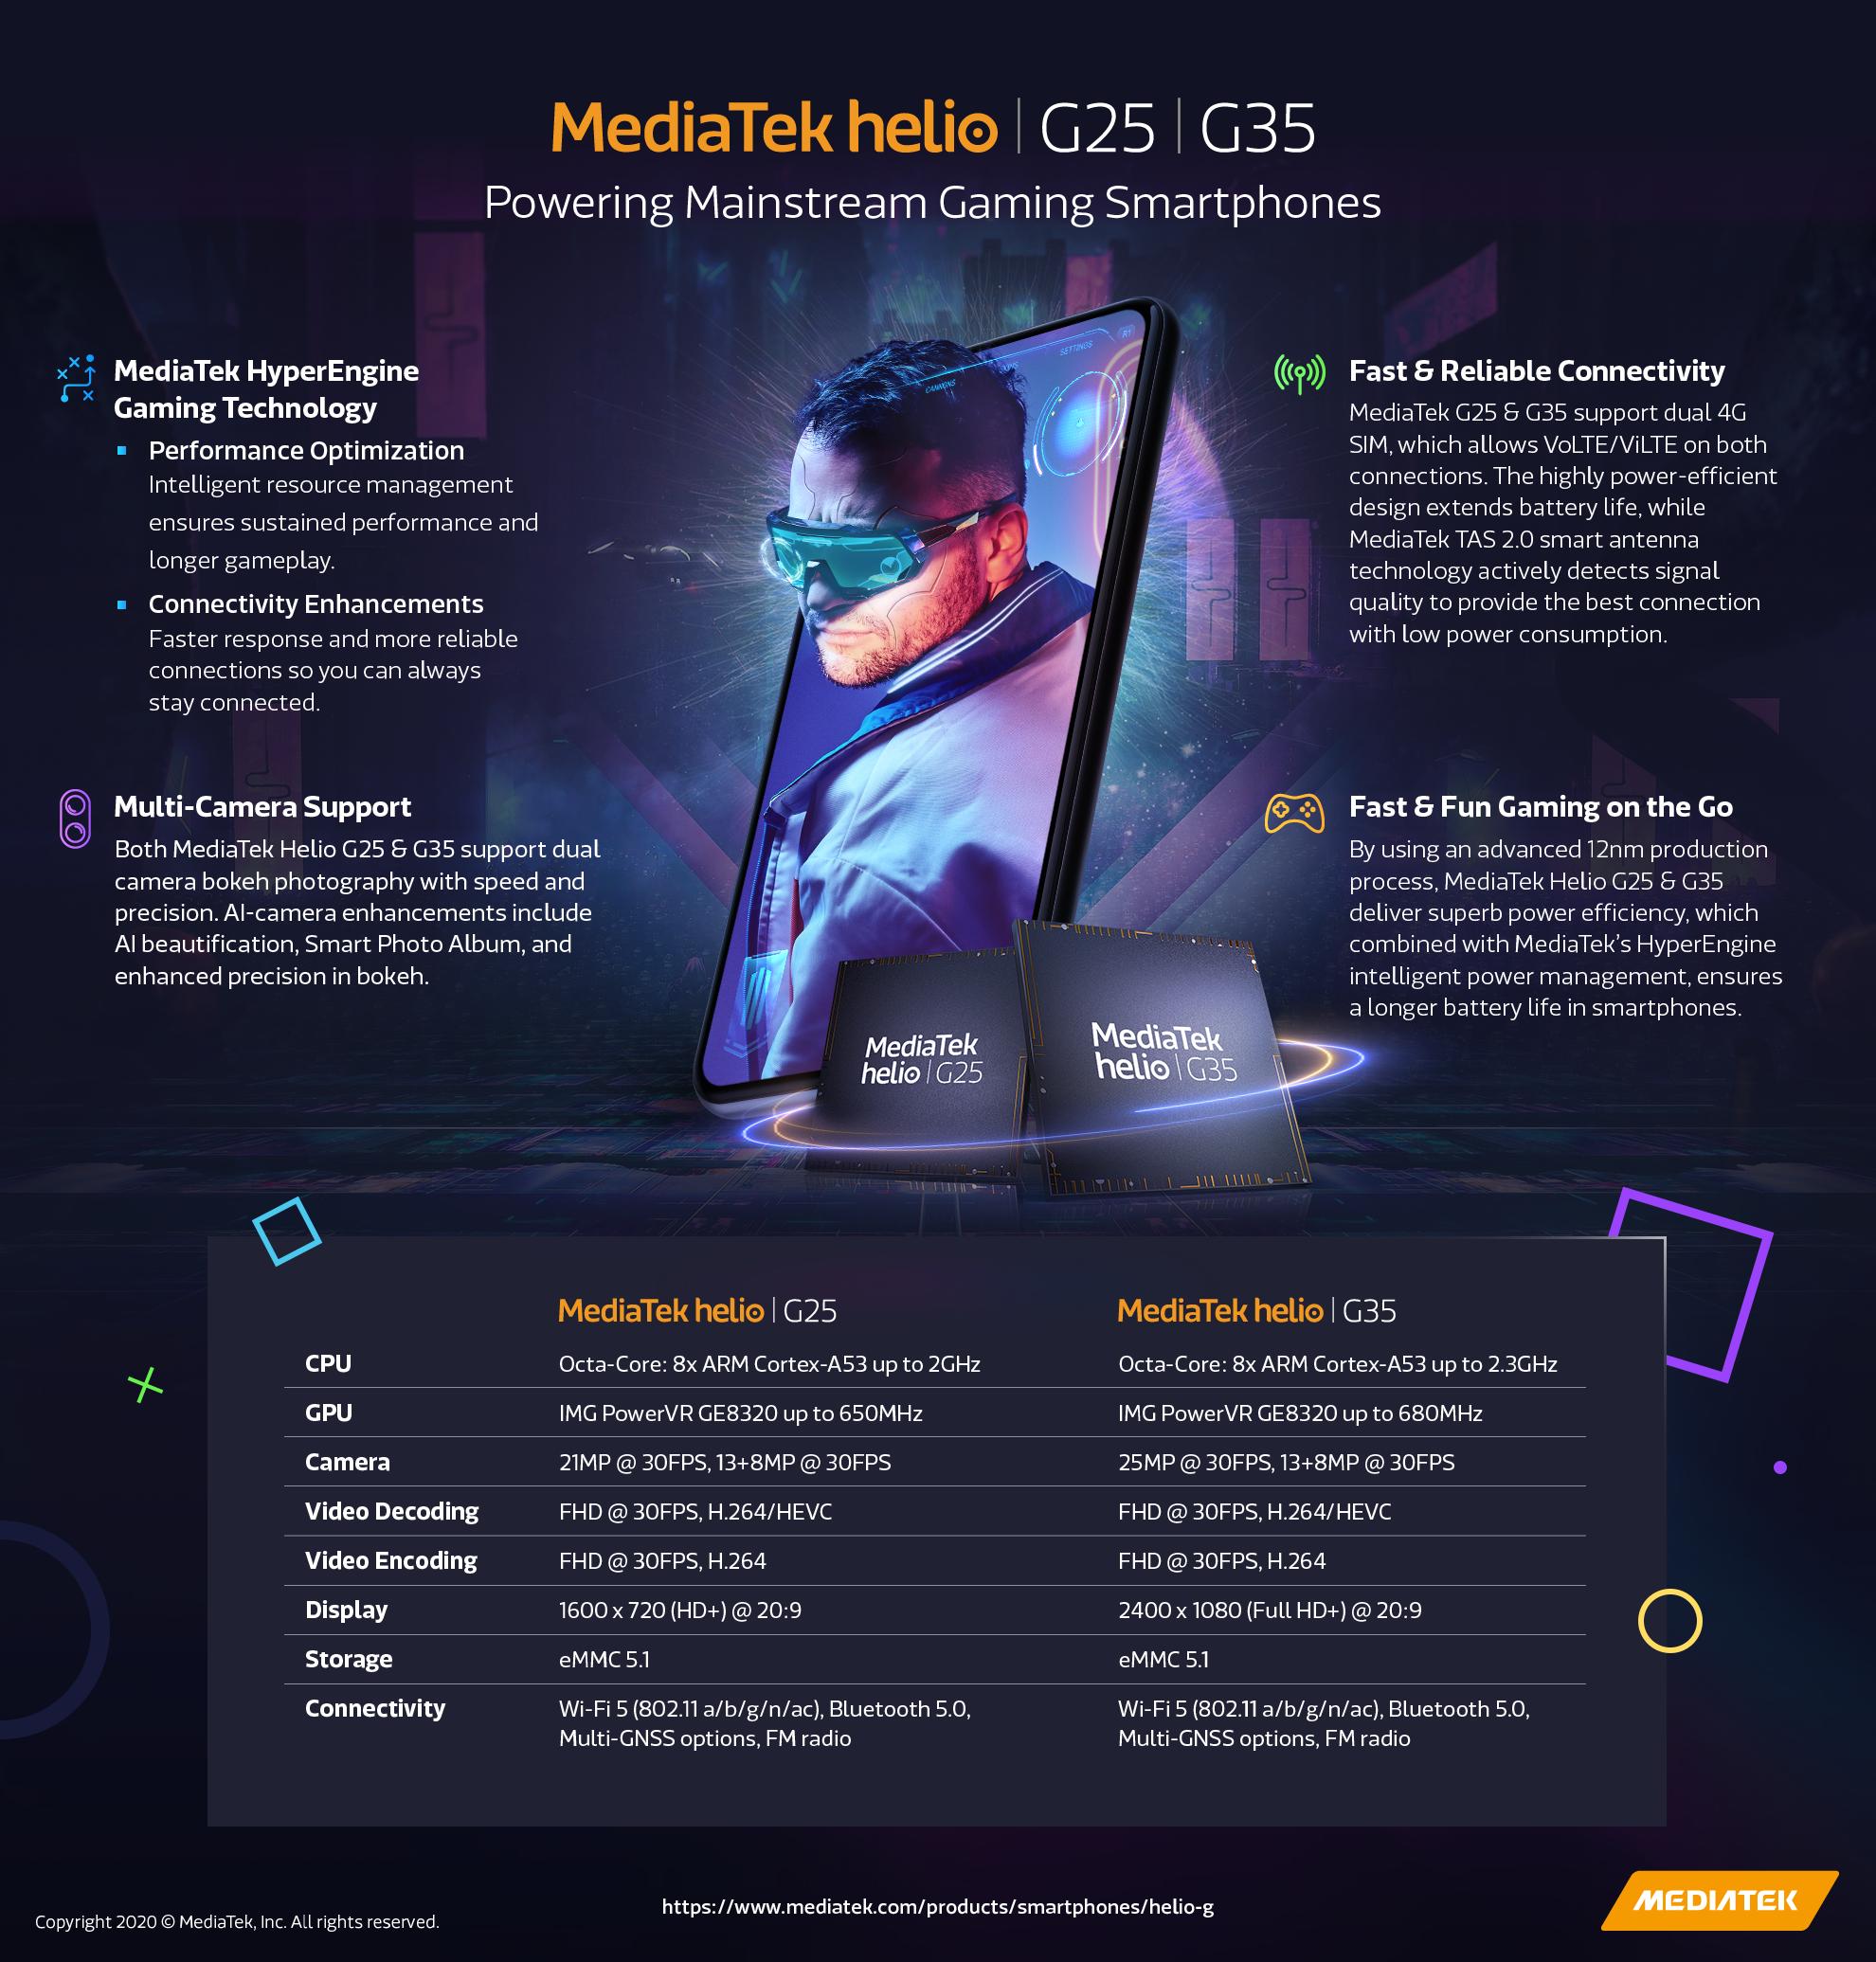 MediaTek Helio G25 & G35 Infographic 0620